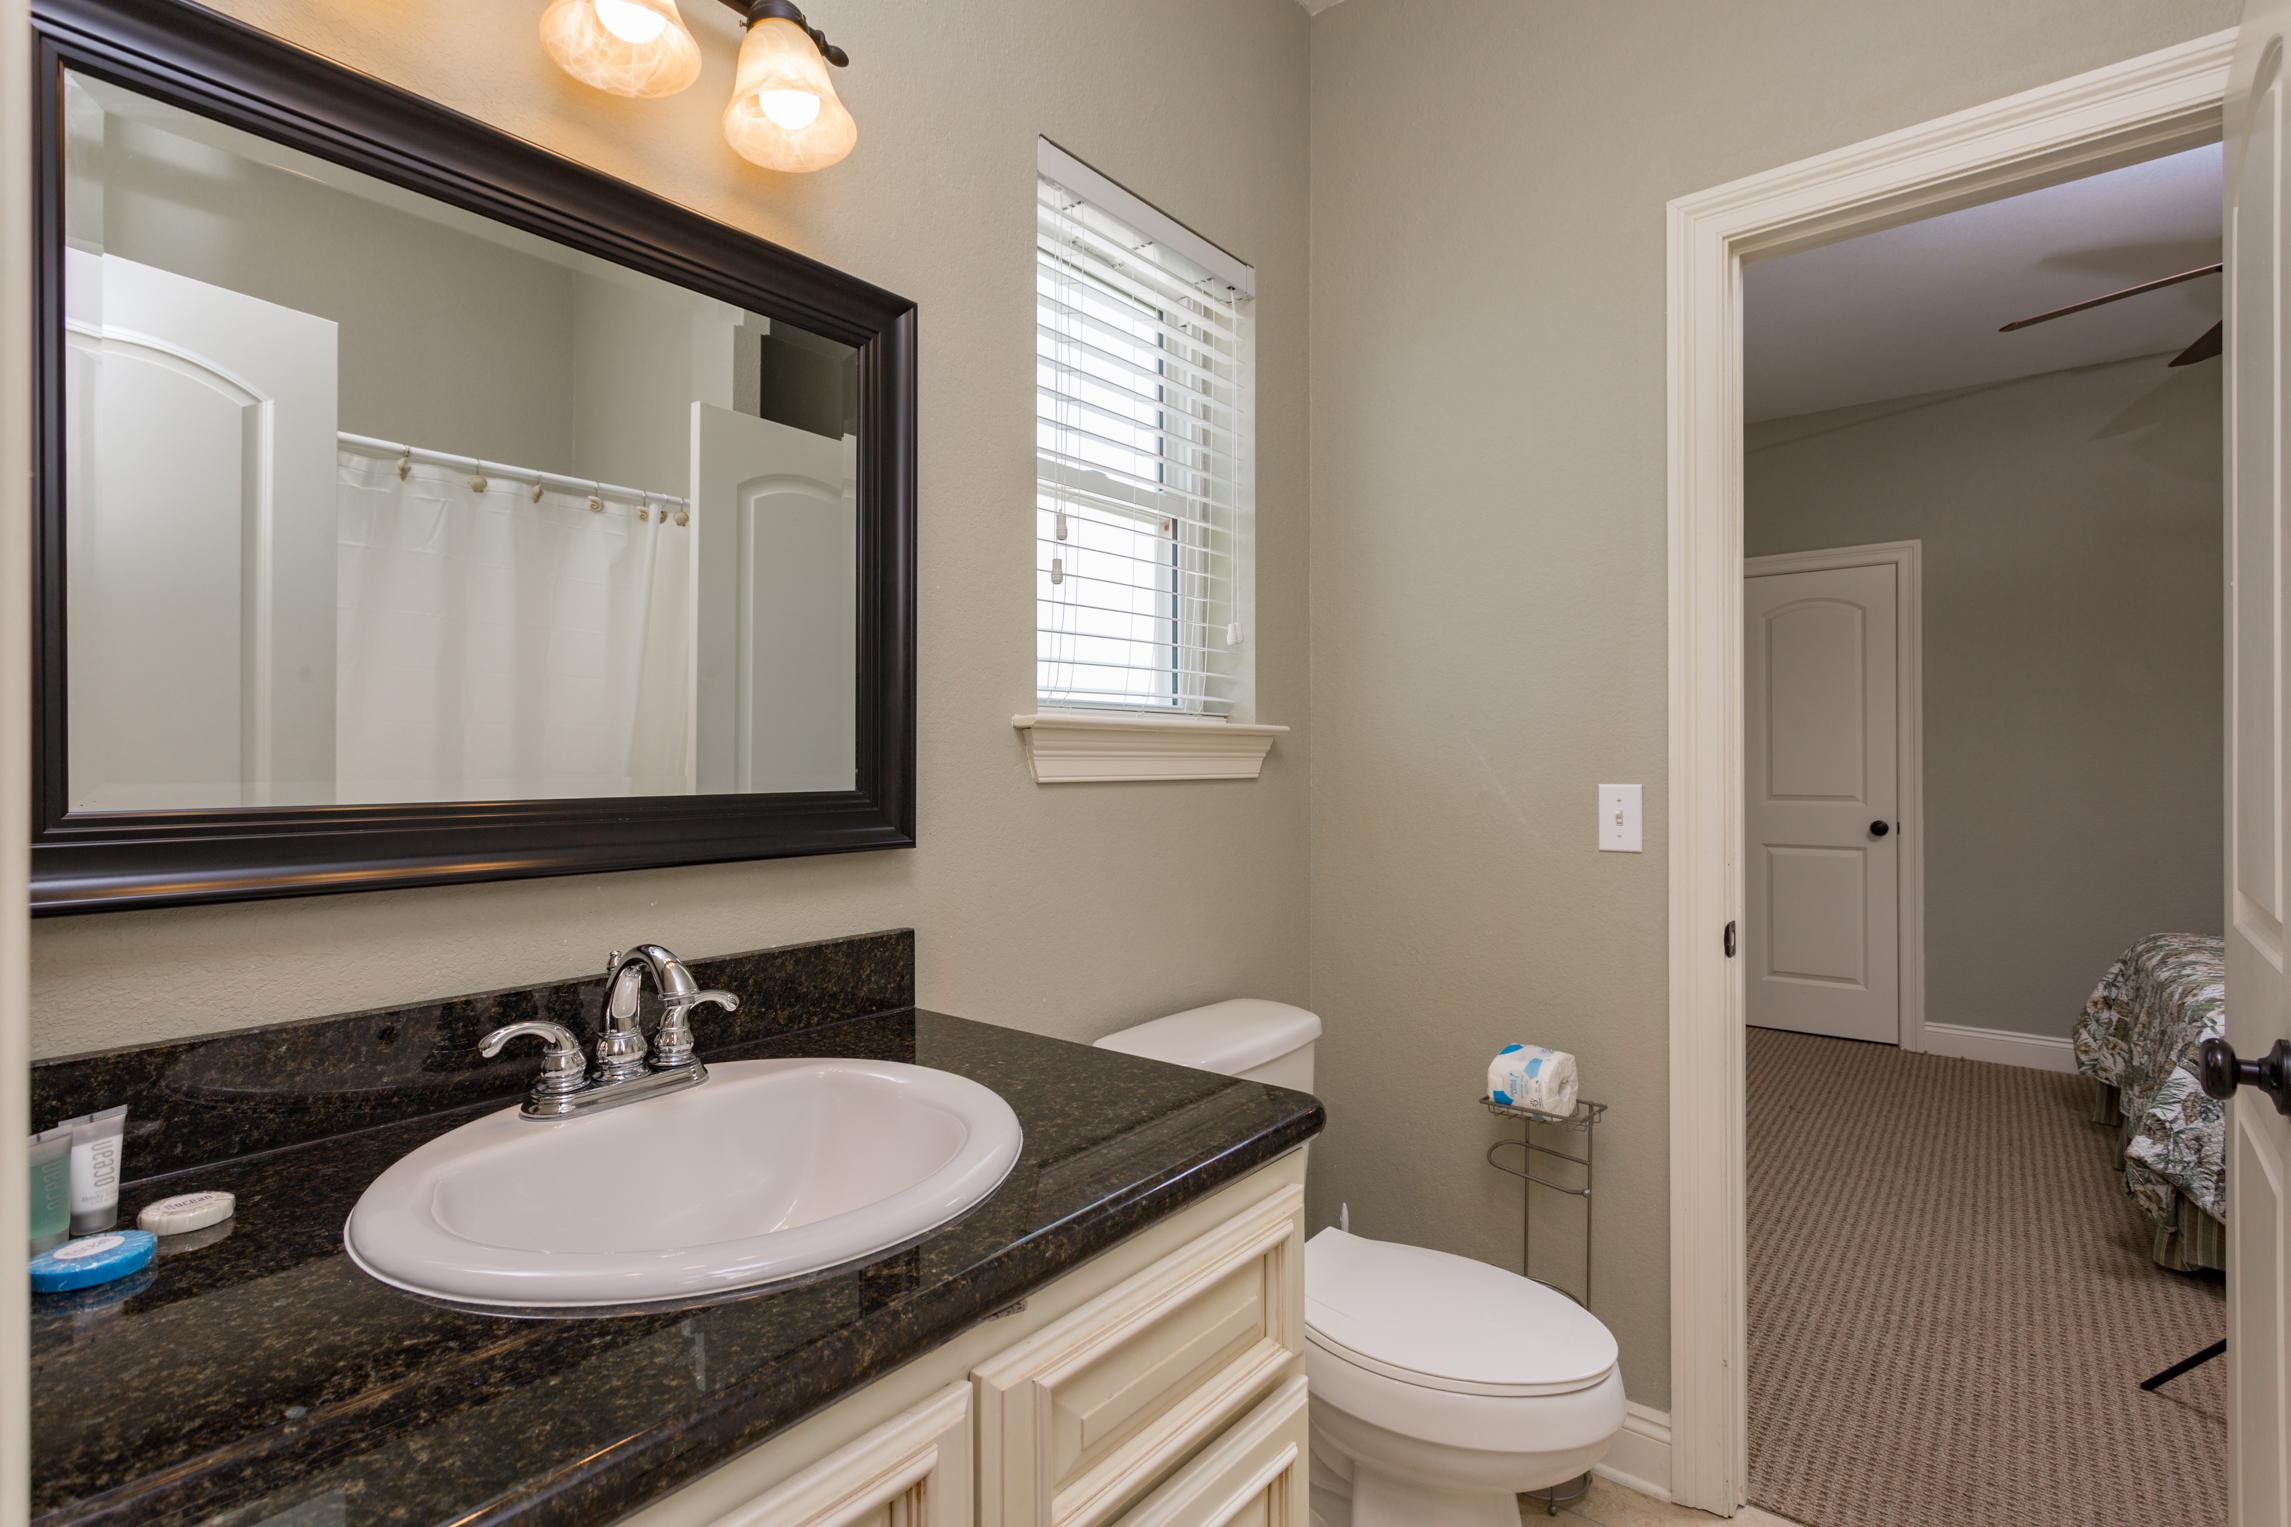 Maldonado 500 House/Cottage rental in Pensacola Beach House Rentals in Pensacola Beach Florida - #21